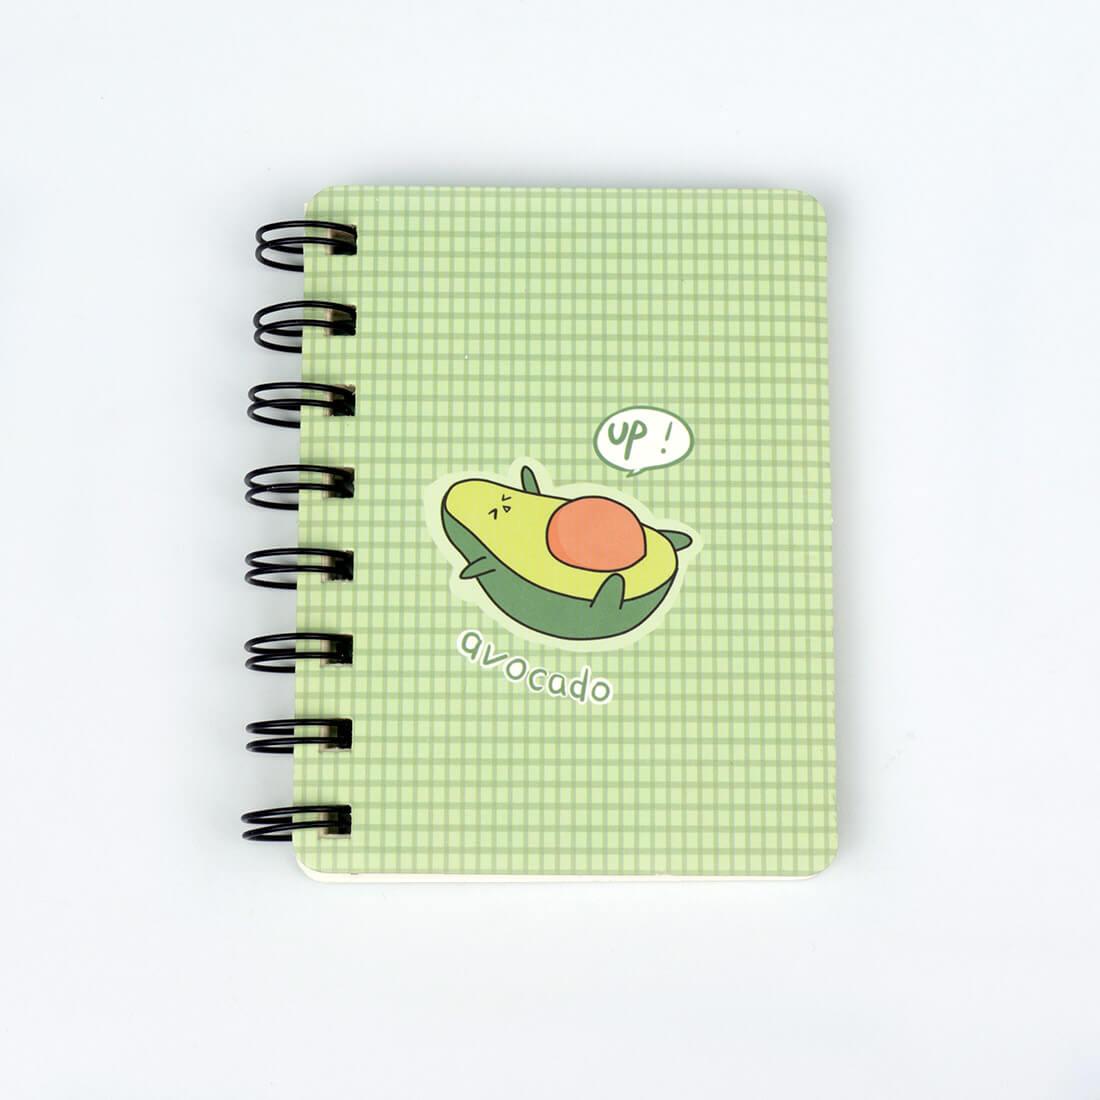 notizbuch liegende avocado